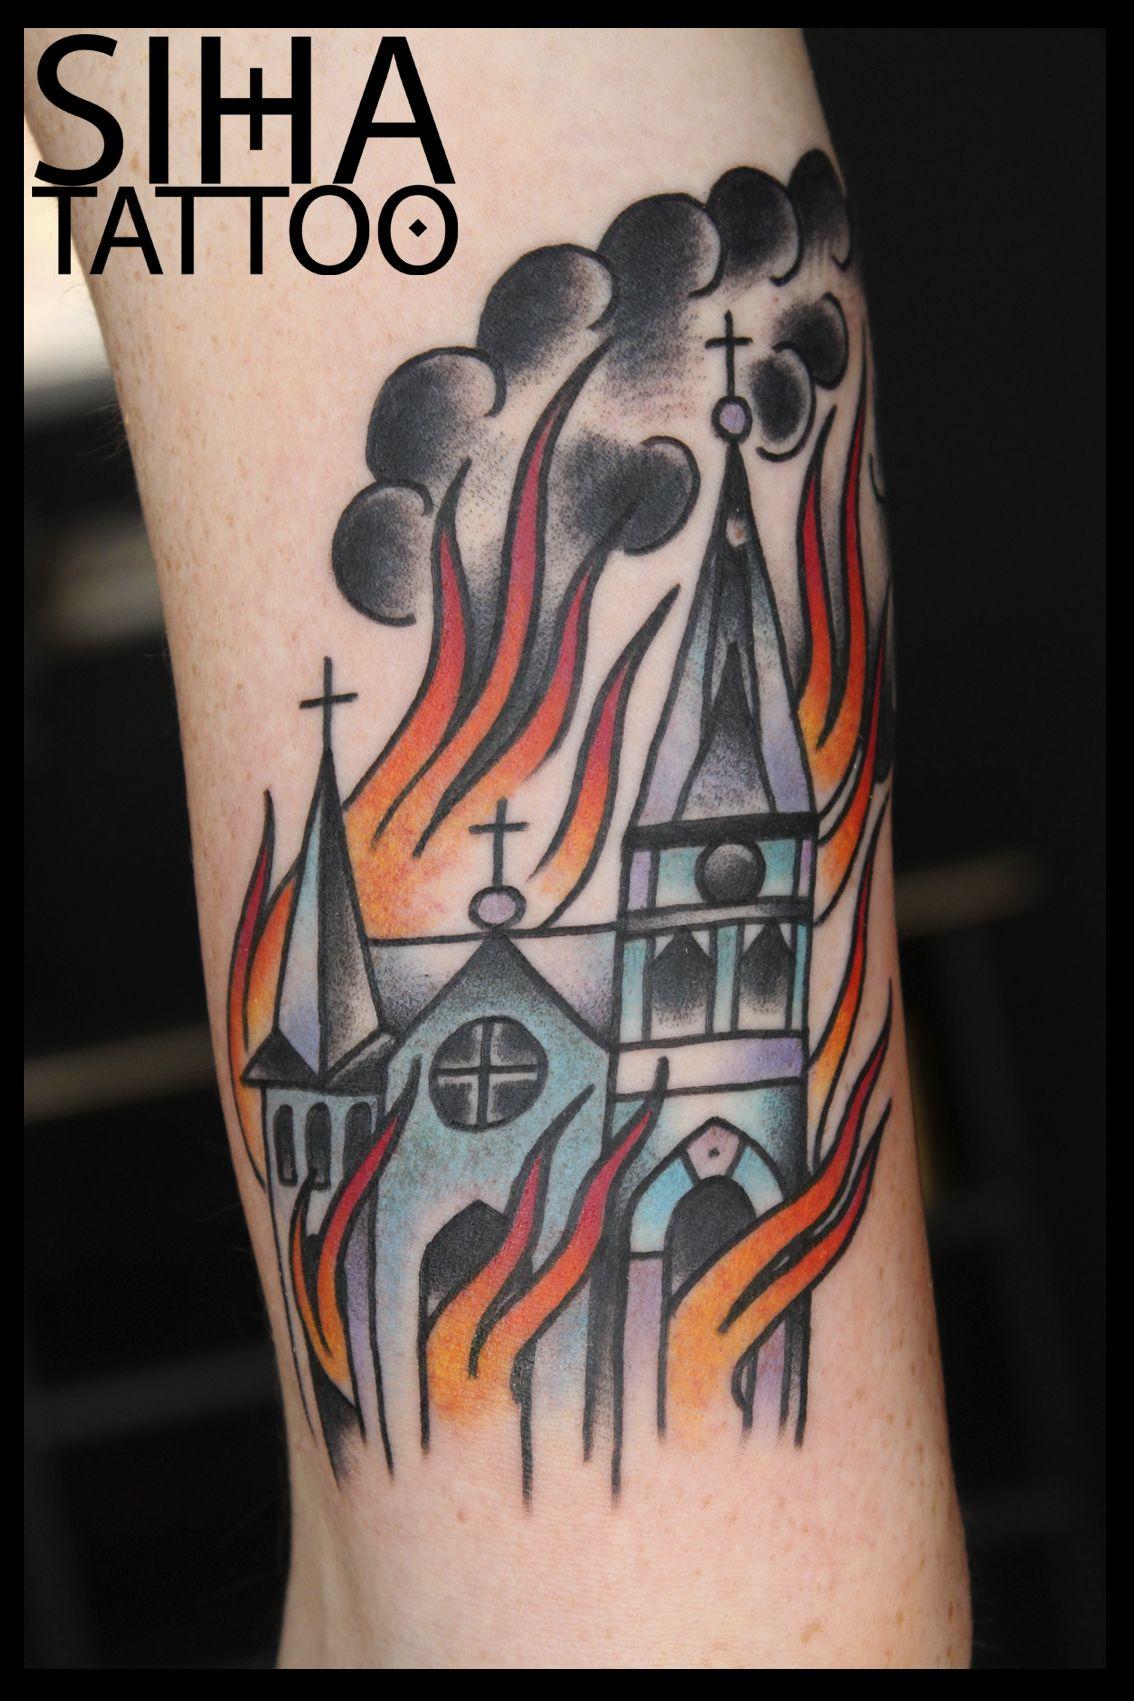 Tool box tattoo by mark old school tattoos by mark pinterest - Church Burning In Flames Fire Tradi Tattoo By Hugo At Siha Tattoo